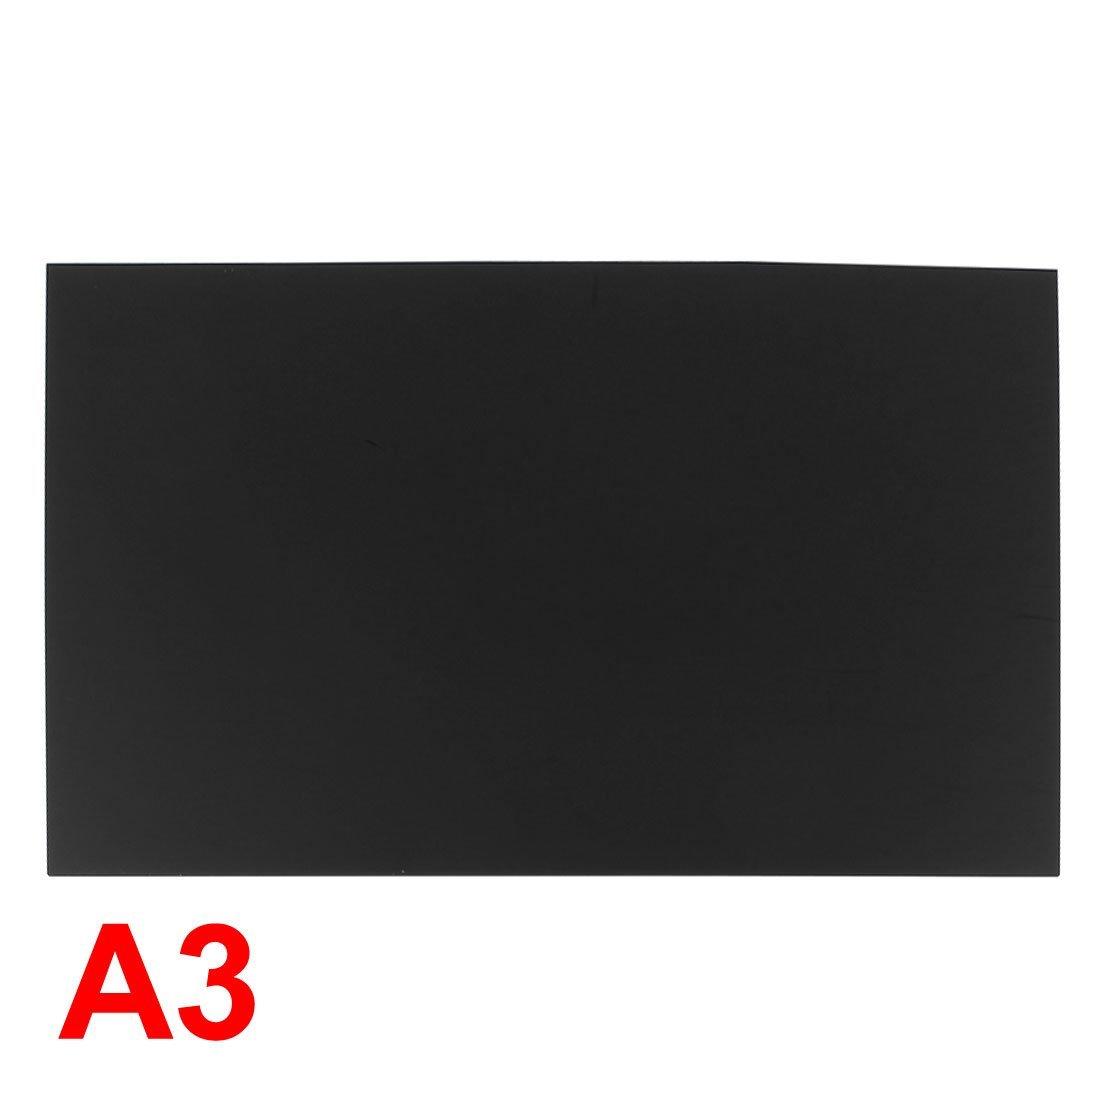 Schwarz Kunststoff Acryl Plexiglas Blatt A3 Gr/ö/ße 297mm x 420mm x 2mm